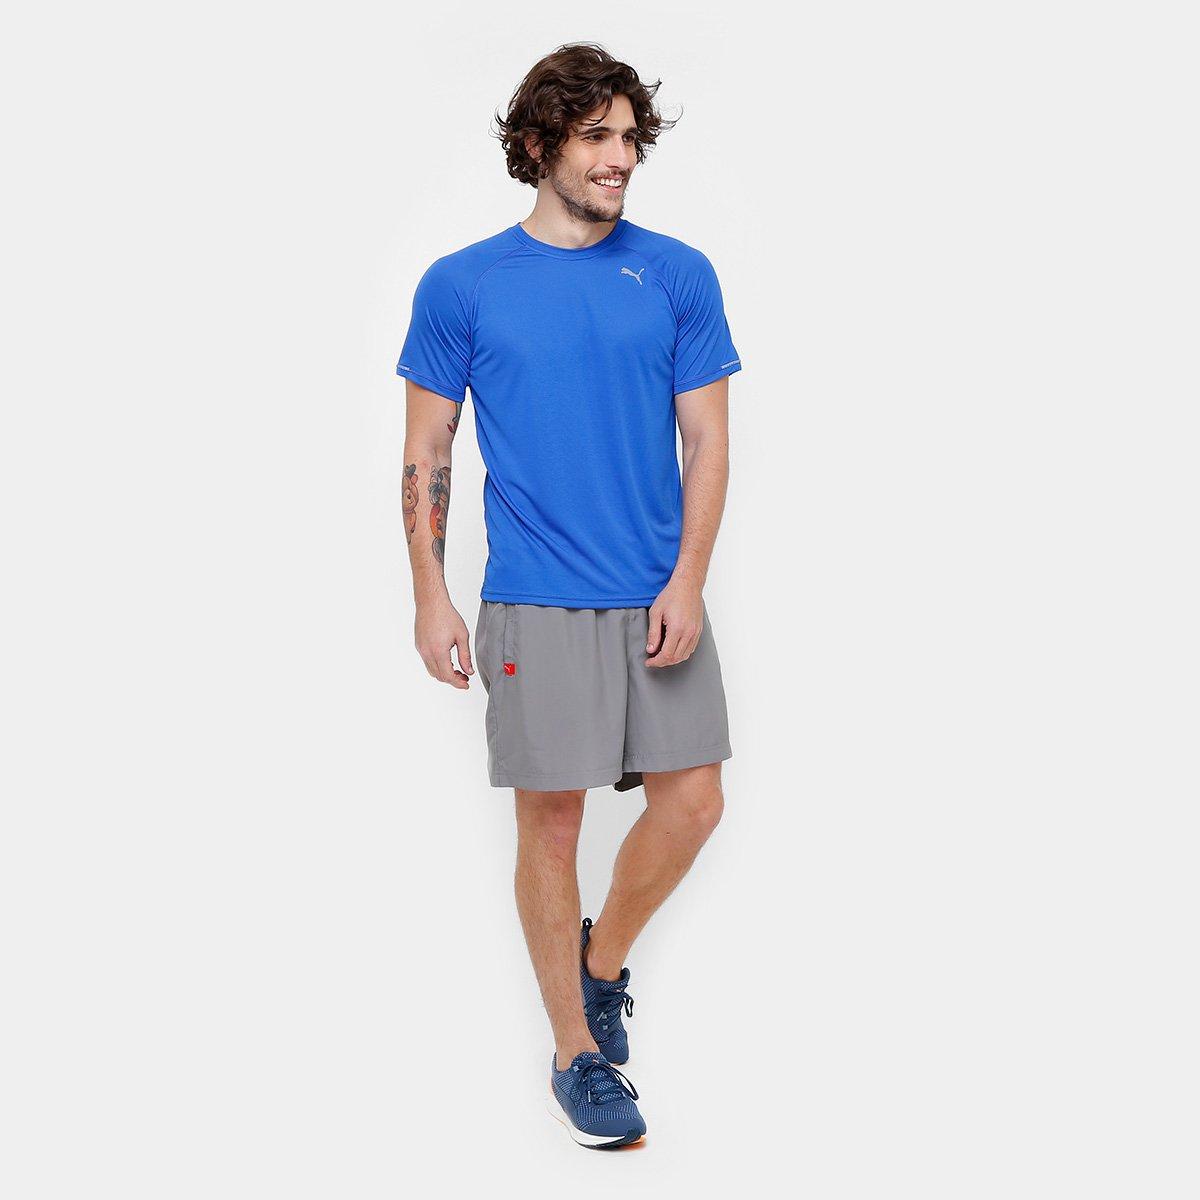 d1583f57e7 Camiseta Puma Core-Run Masculina - Compre Agora